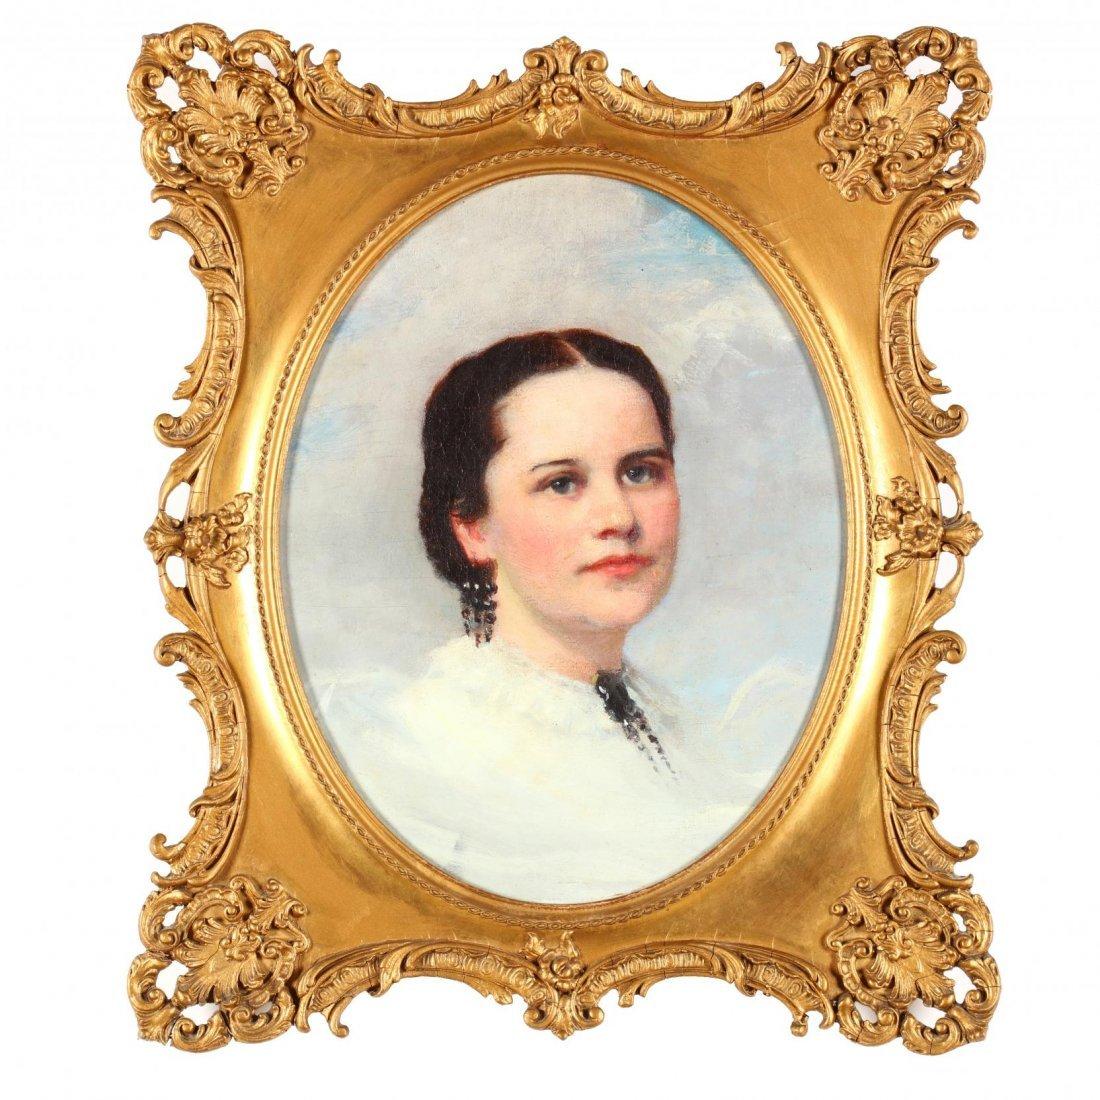 William Morton Jackson Rice (NY, 1854-1922), Portrait